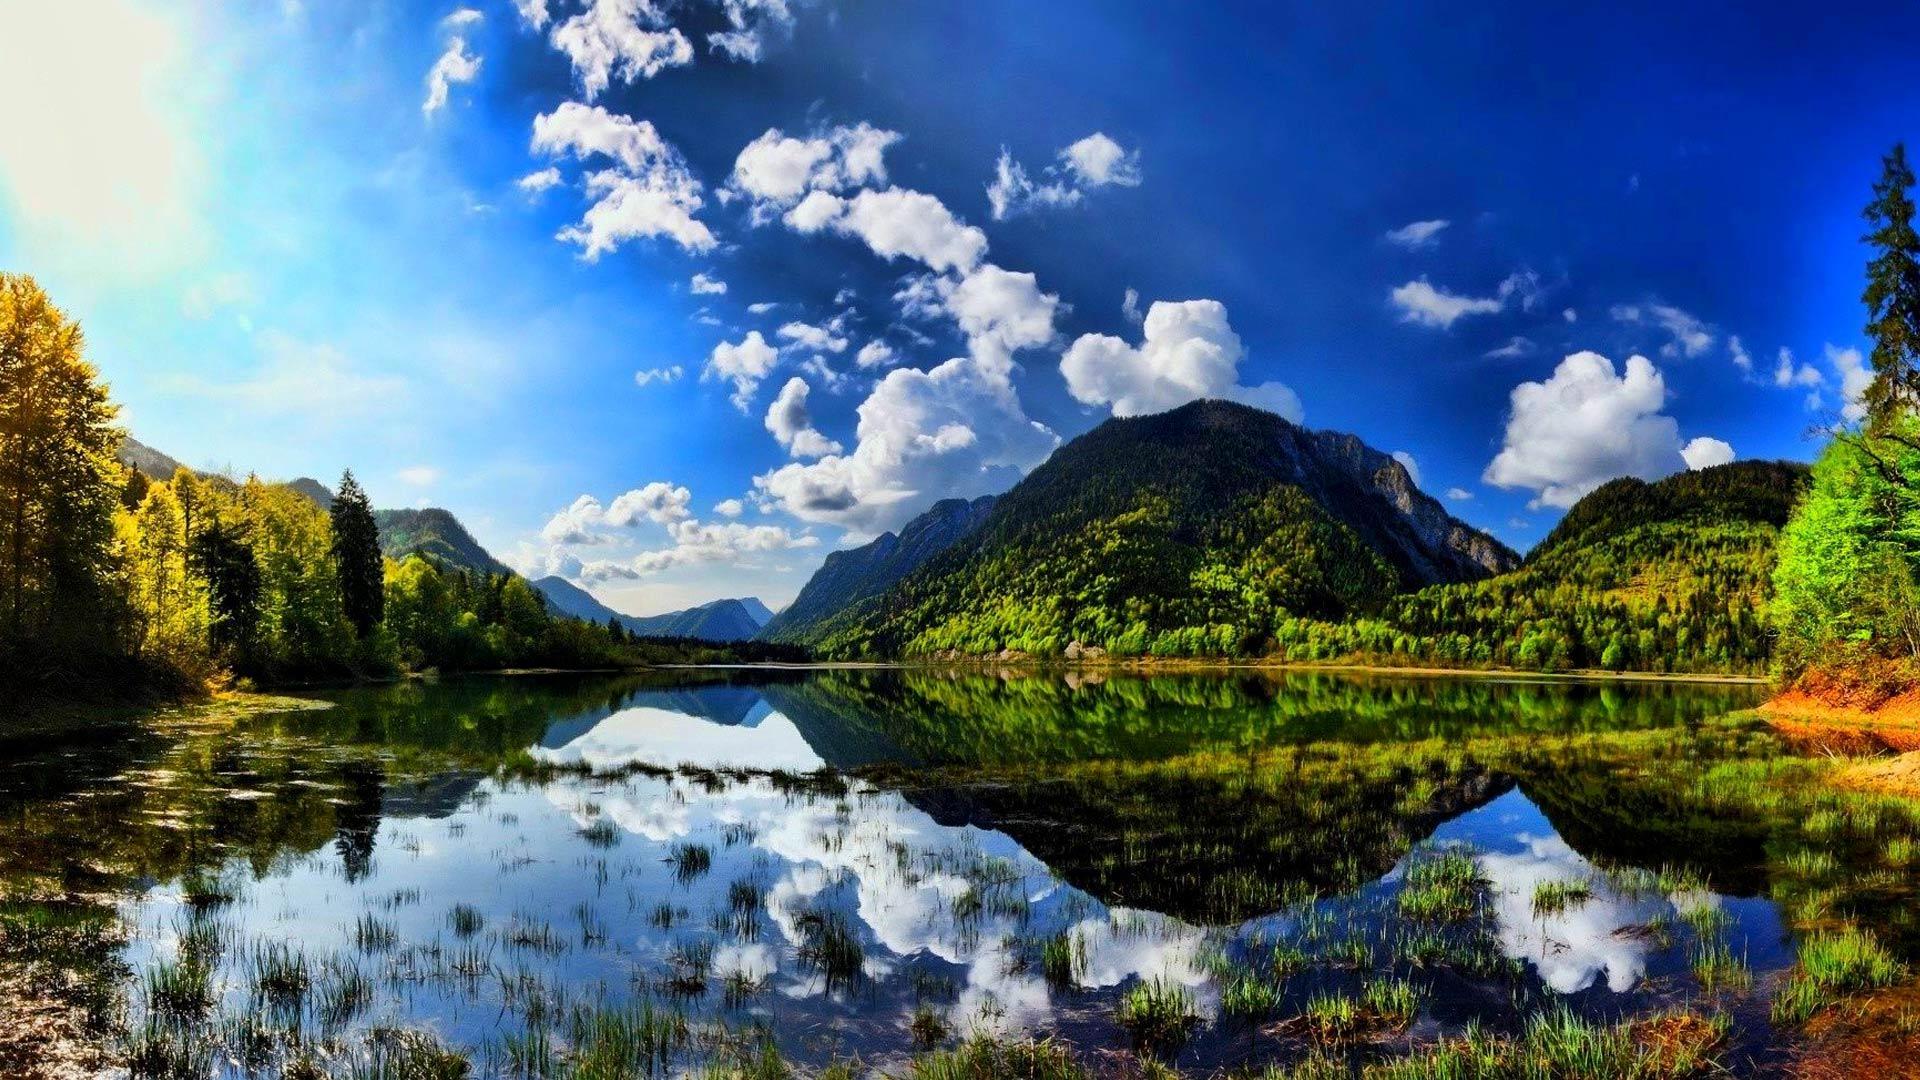 Desktop wallpaper mountain scenes wallpapersafari - Mountain screensavers free ...